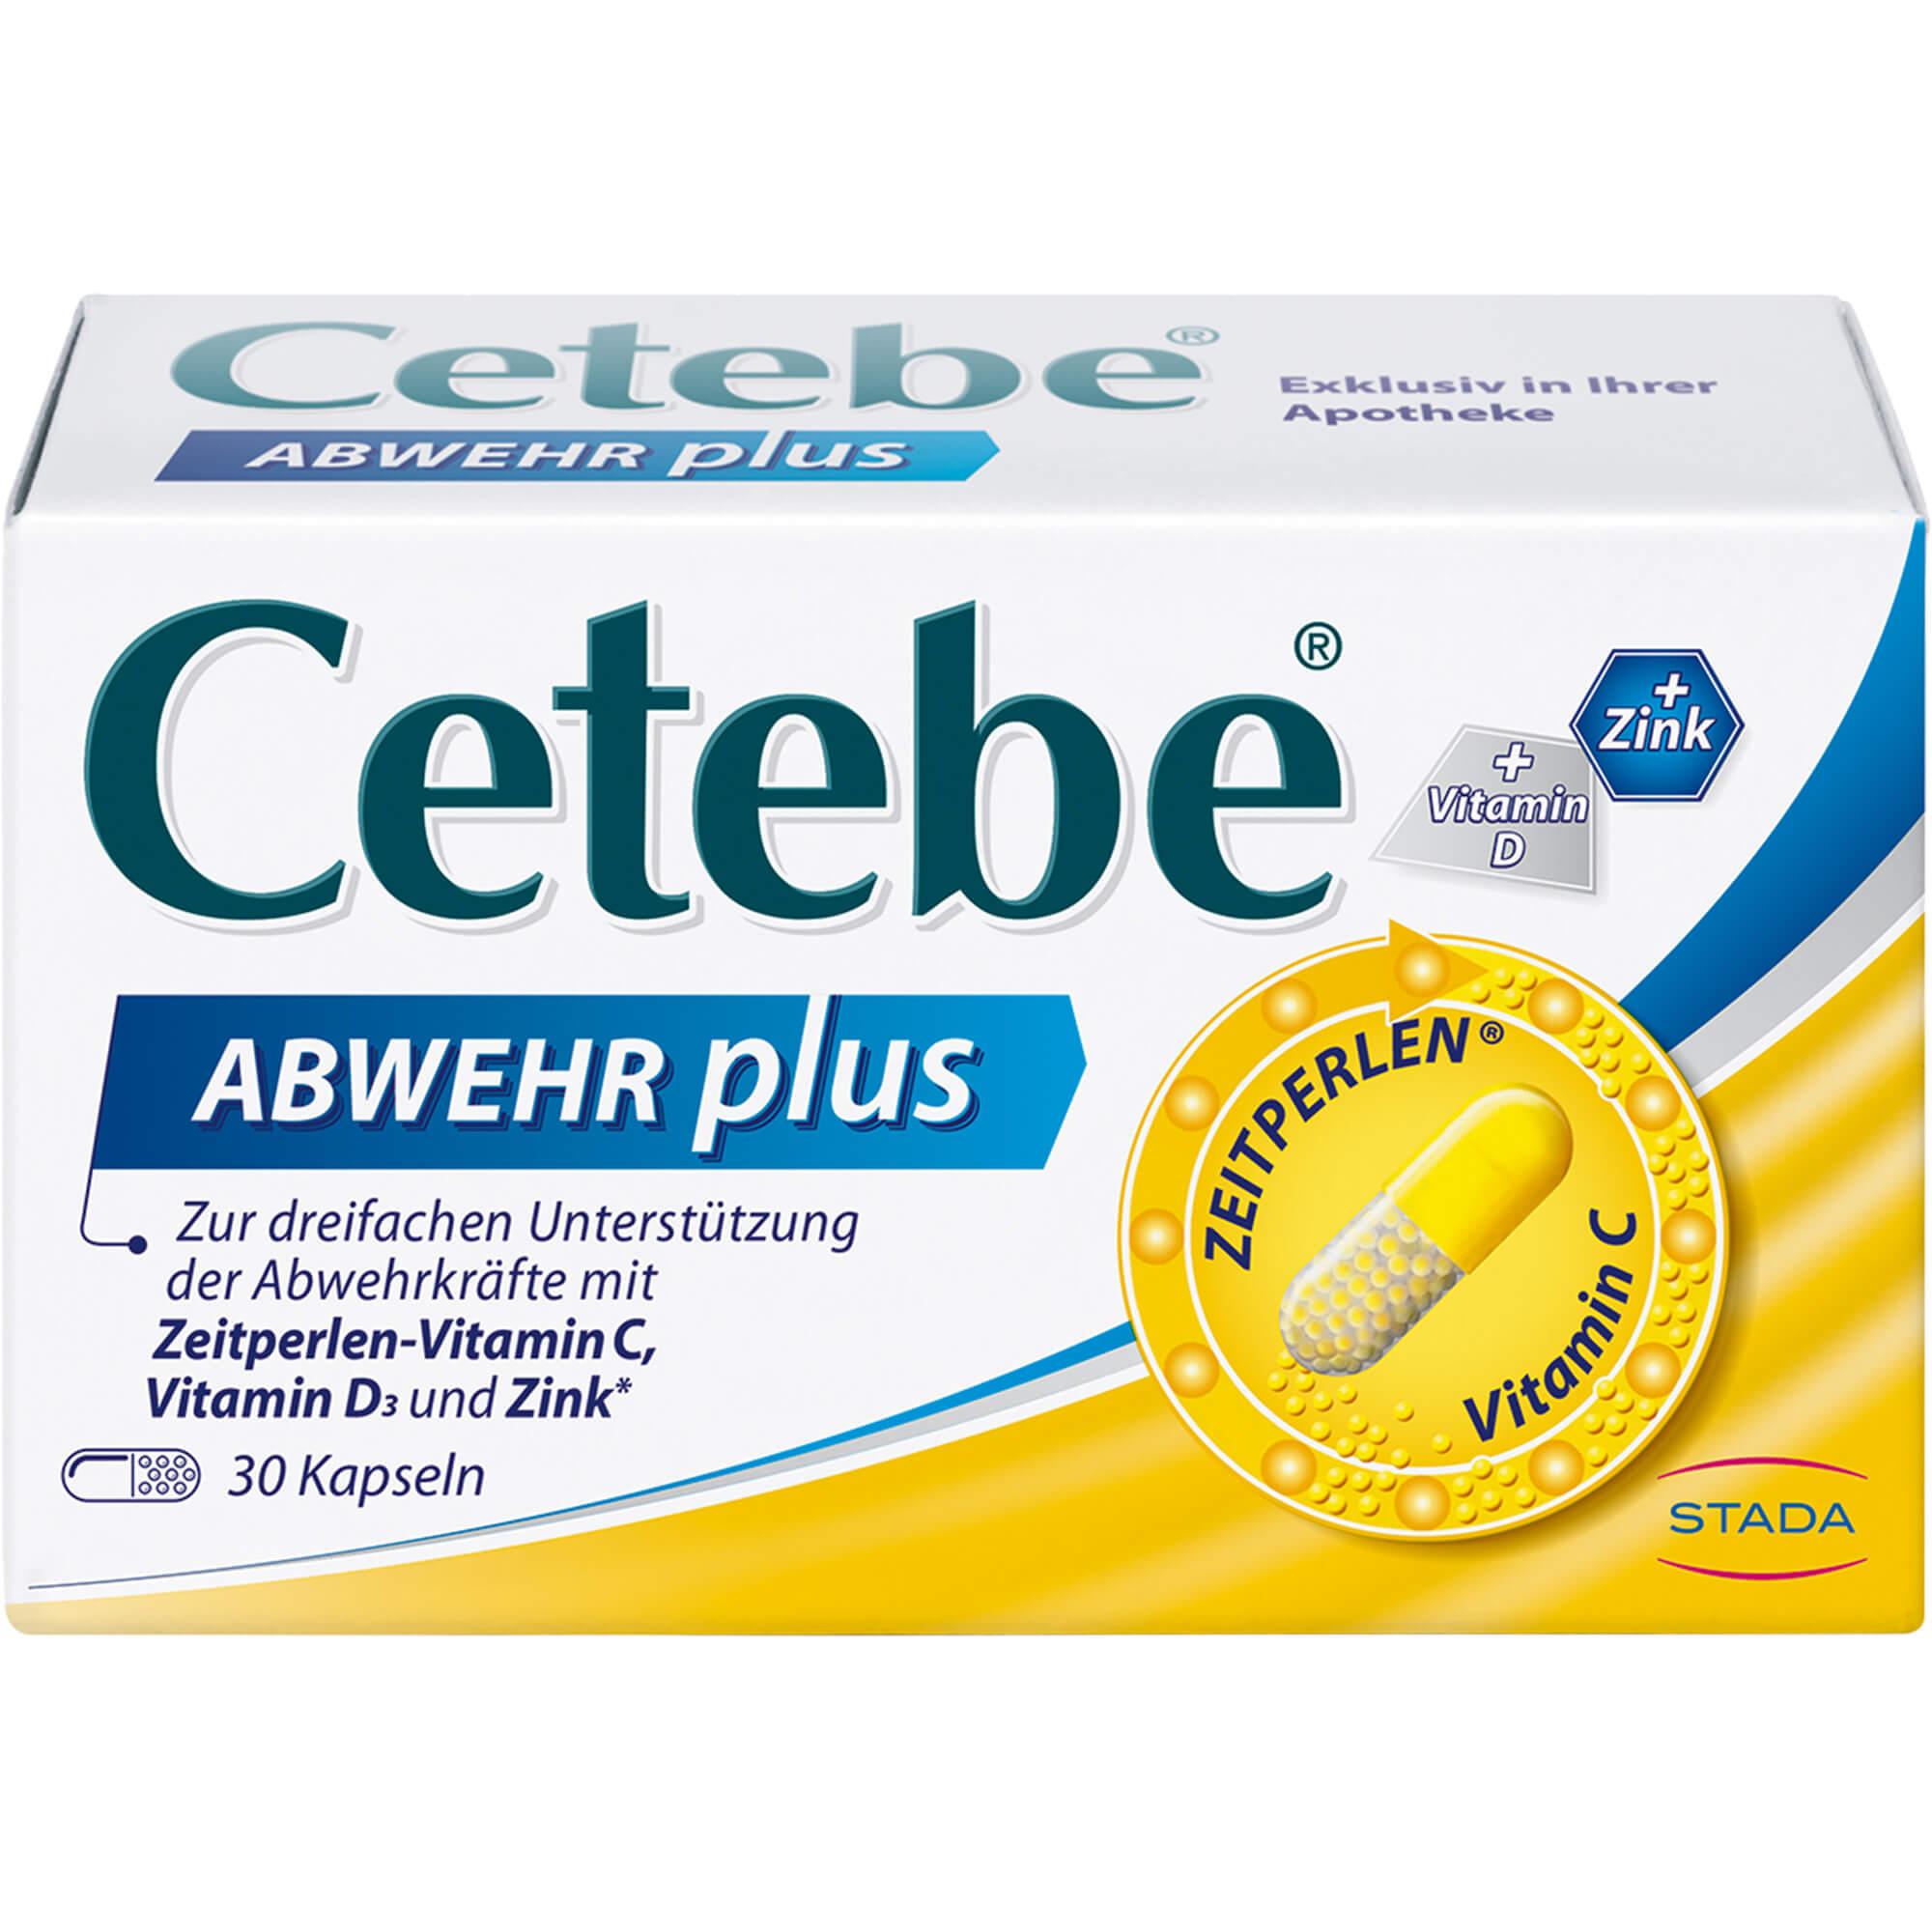 CETEBE-ABWEHR-plus-Vitamin-C-Vitamin-D3-Zink-Kaps